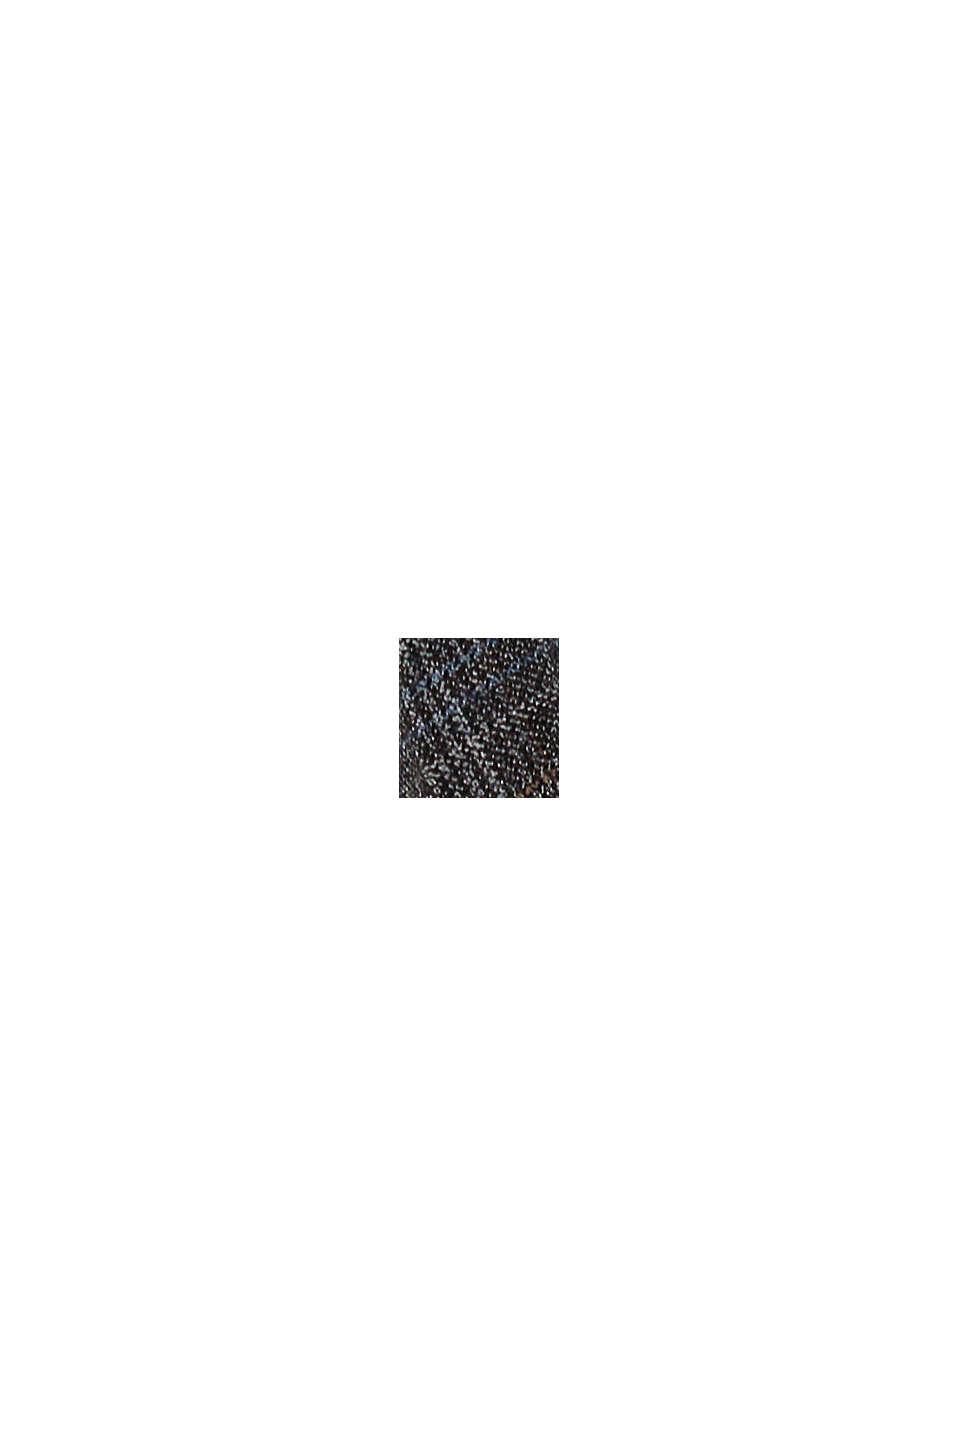 Recycelt: WINTERCHECK Mix & Match Plisseerock, ANTHRACITE, swatch